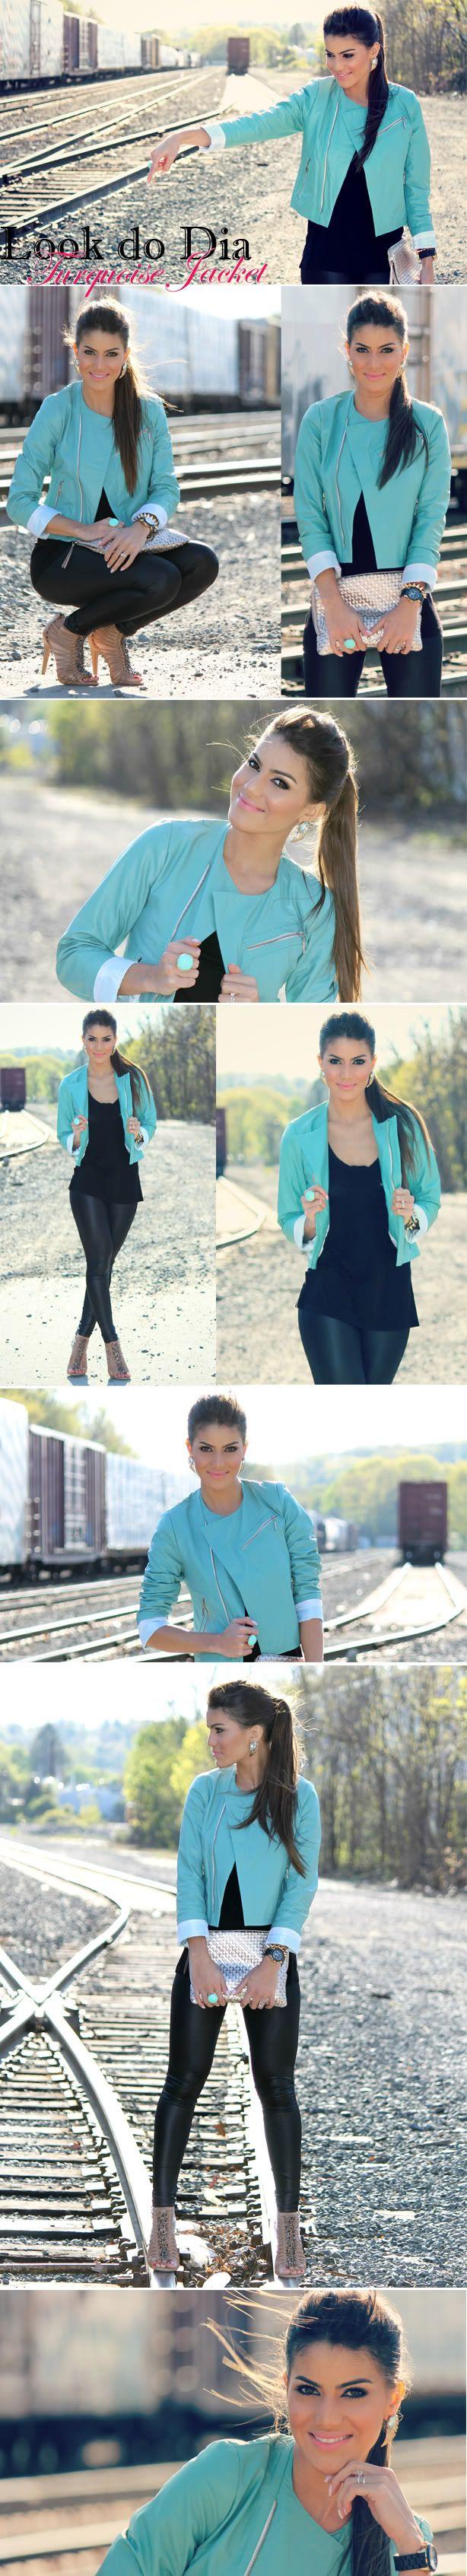 Look do Dia: Turquoise Jacket